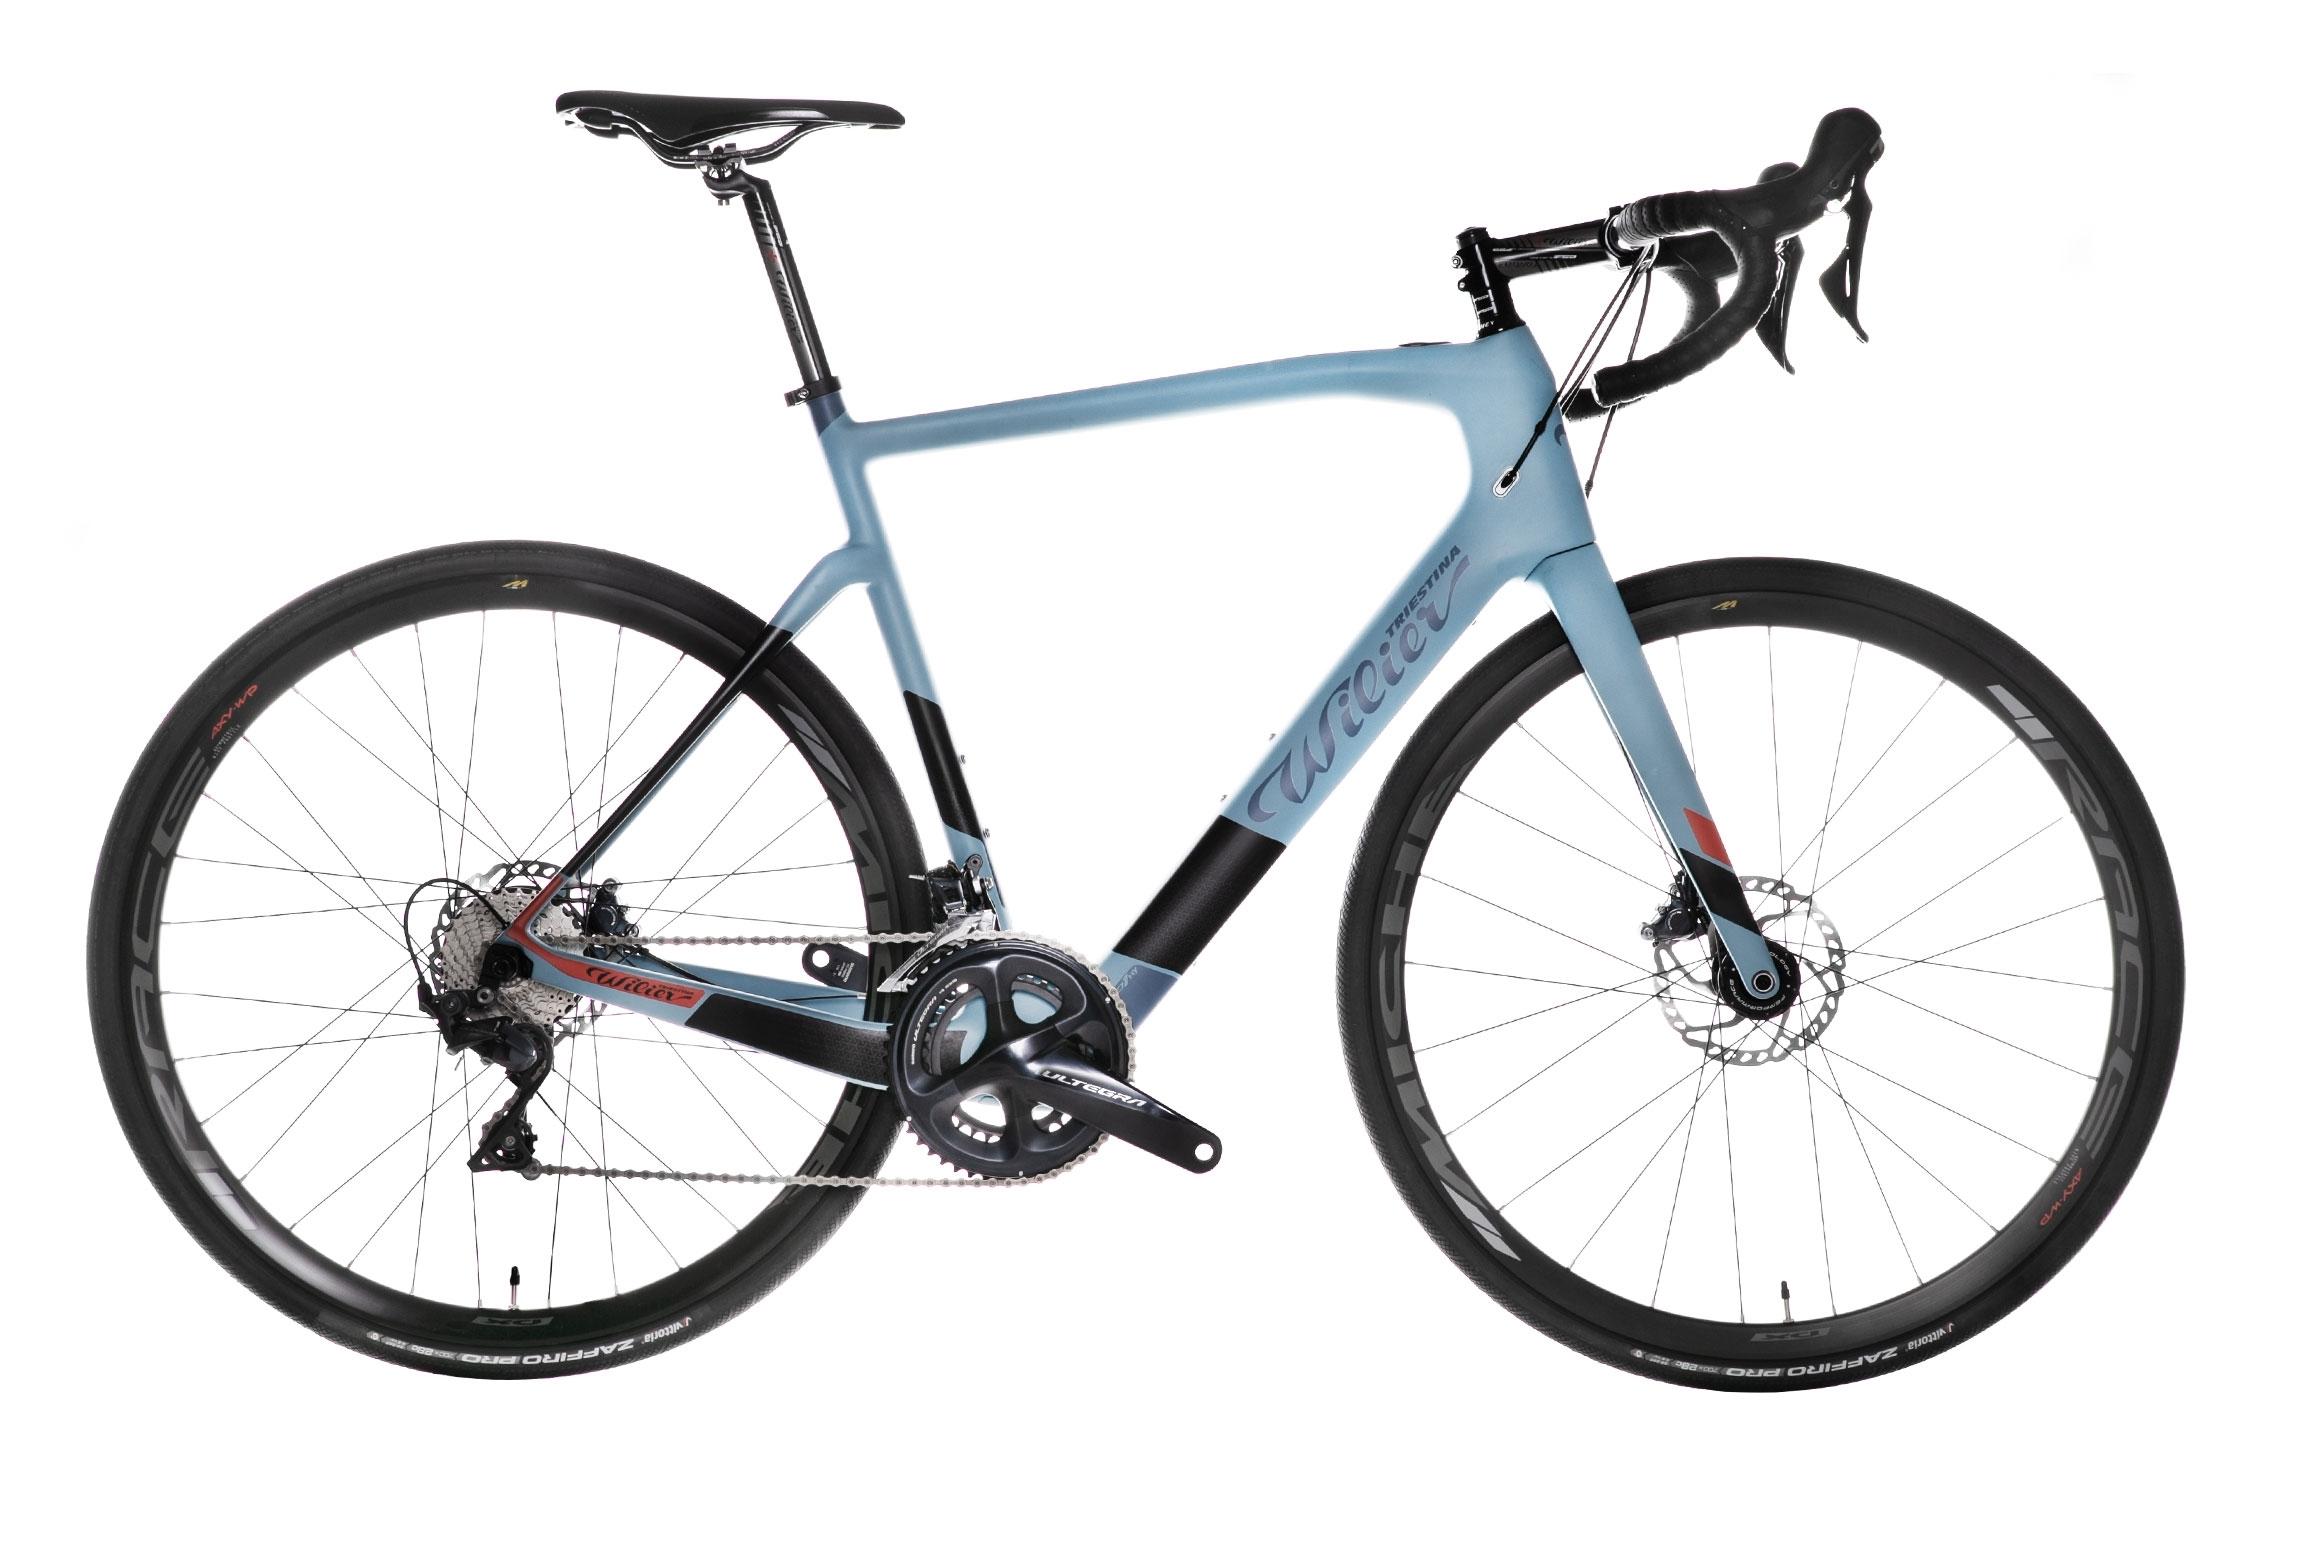 kolo CENTO1HY + ULTEGRA R8020 + MICHE blue black S